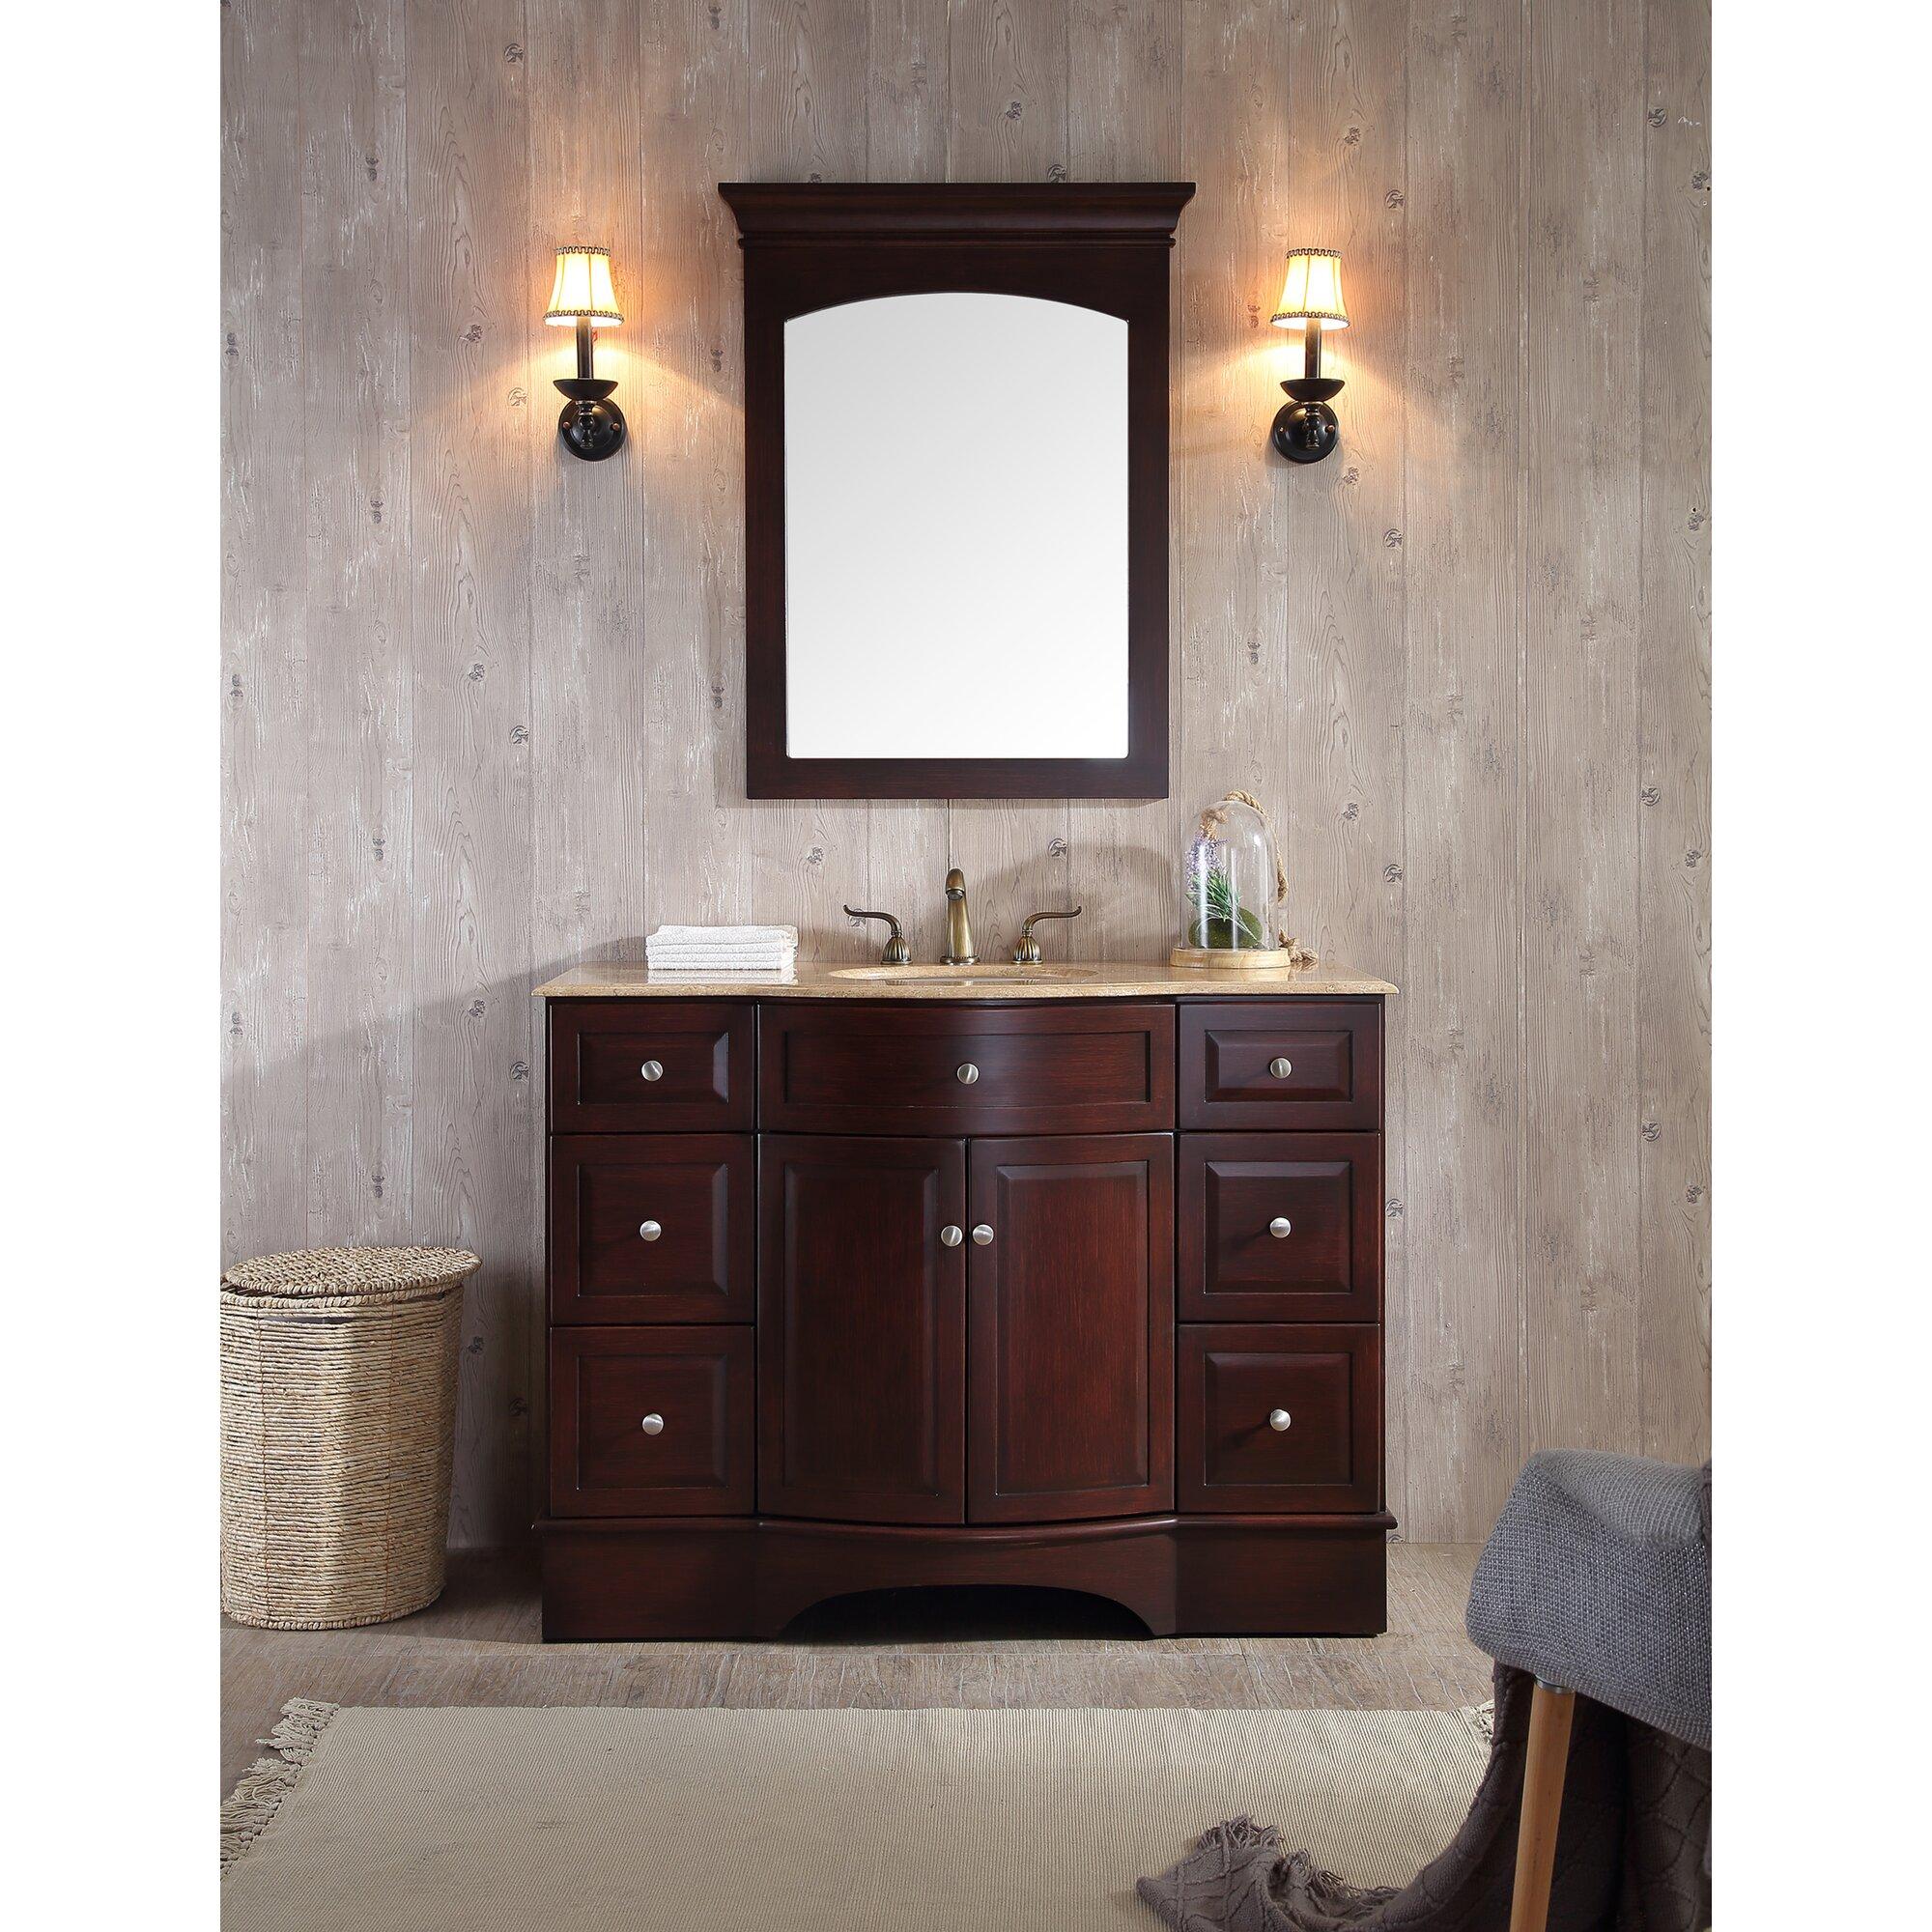 100 48 Inch Bathroom Vanity Bathroom 48 Inch Vanity 72 Inch Design Element London Single 48inch